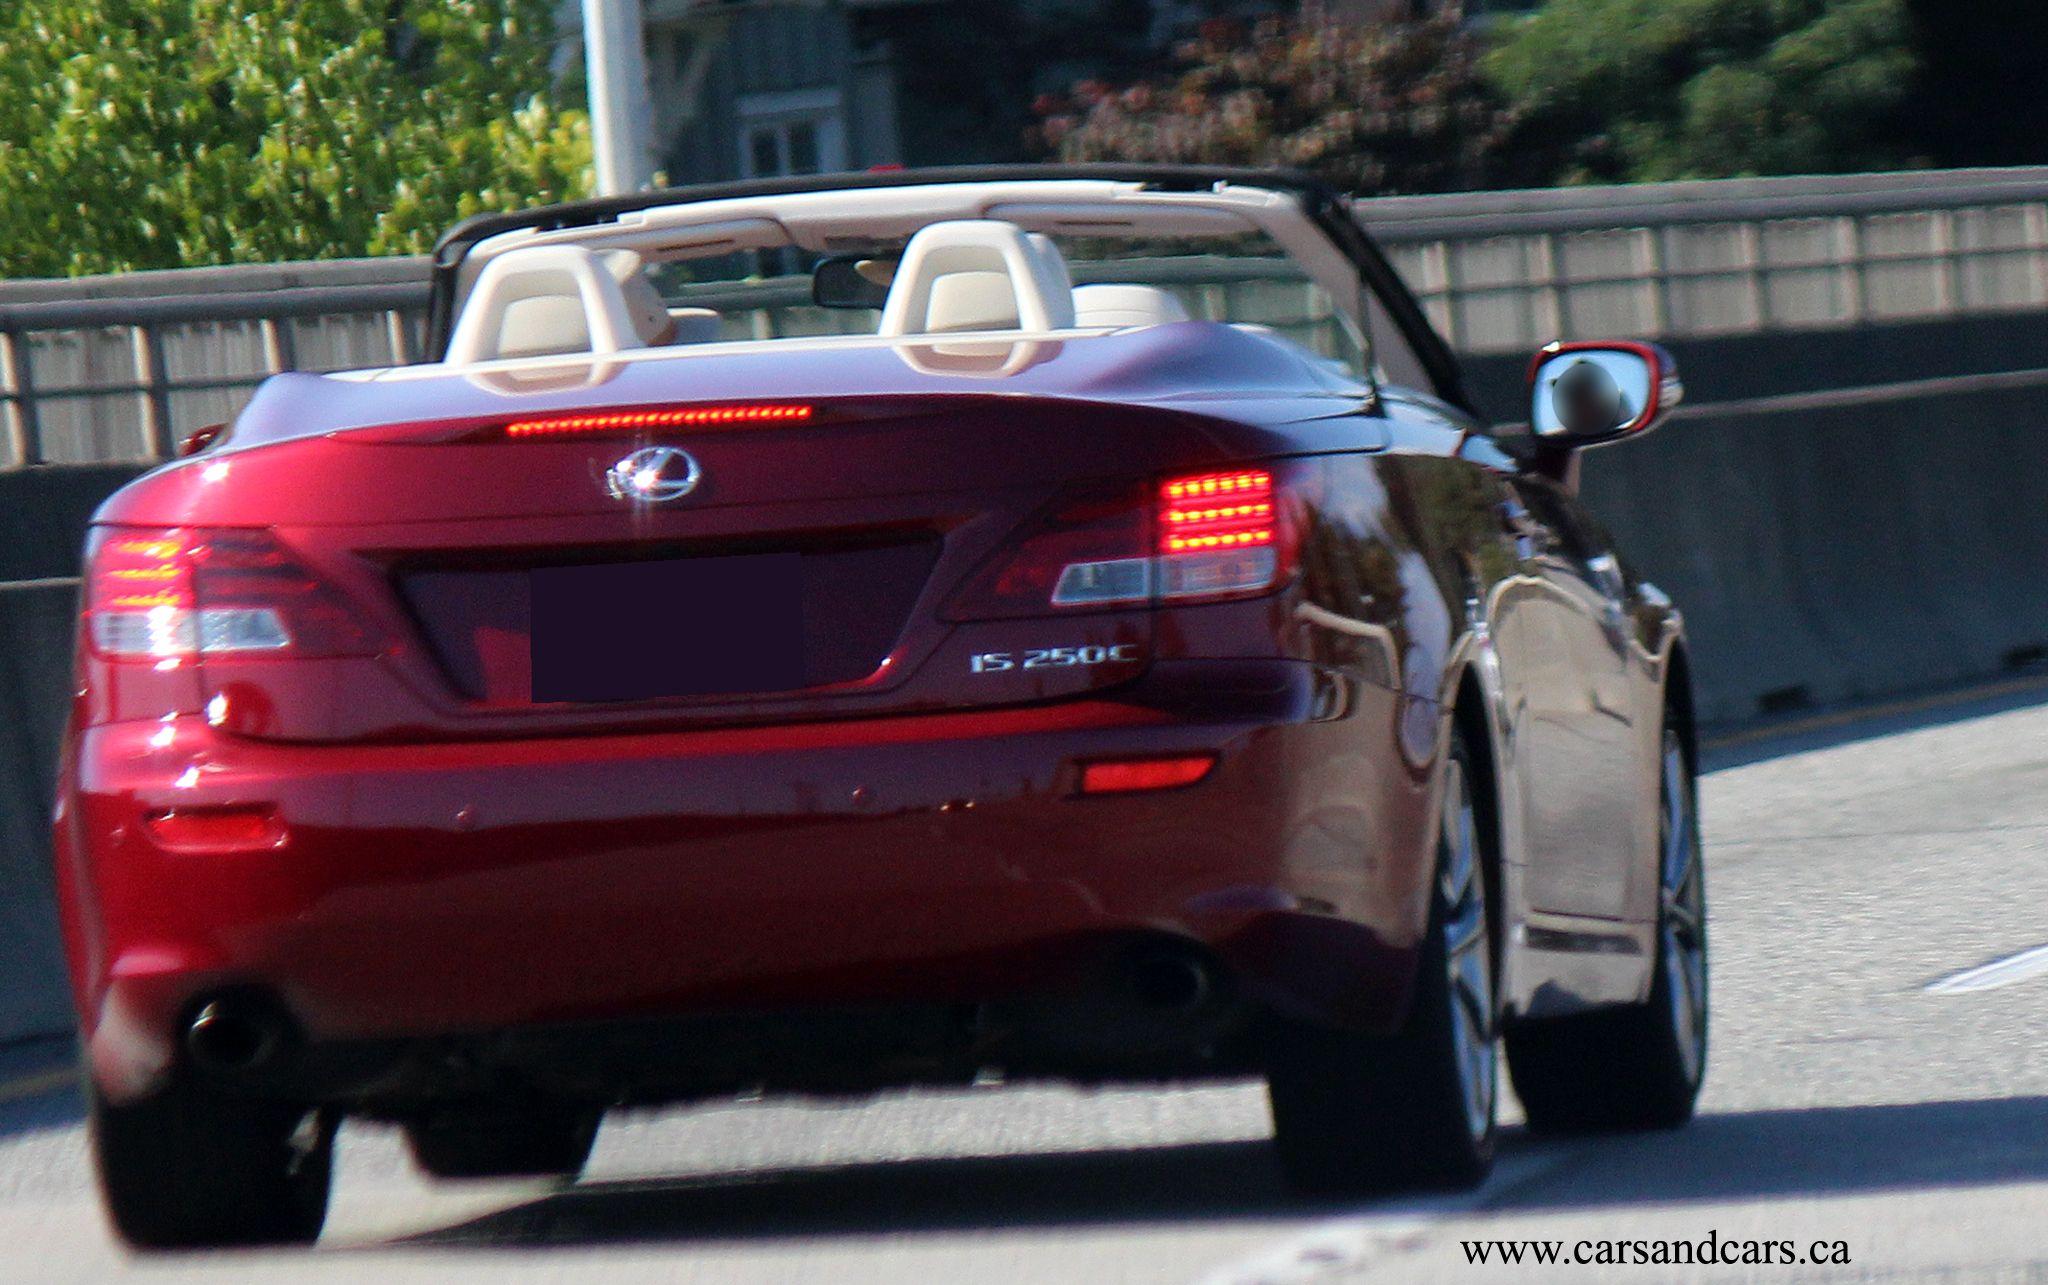 dfadd01831931bce7b78c4b429ab8056 Great Description About 2012 Lexus Es with Fascinating Images Cars Review